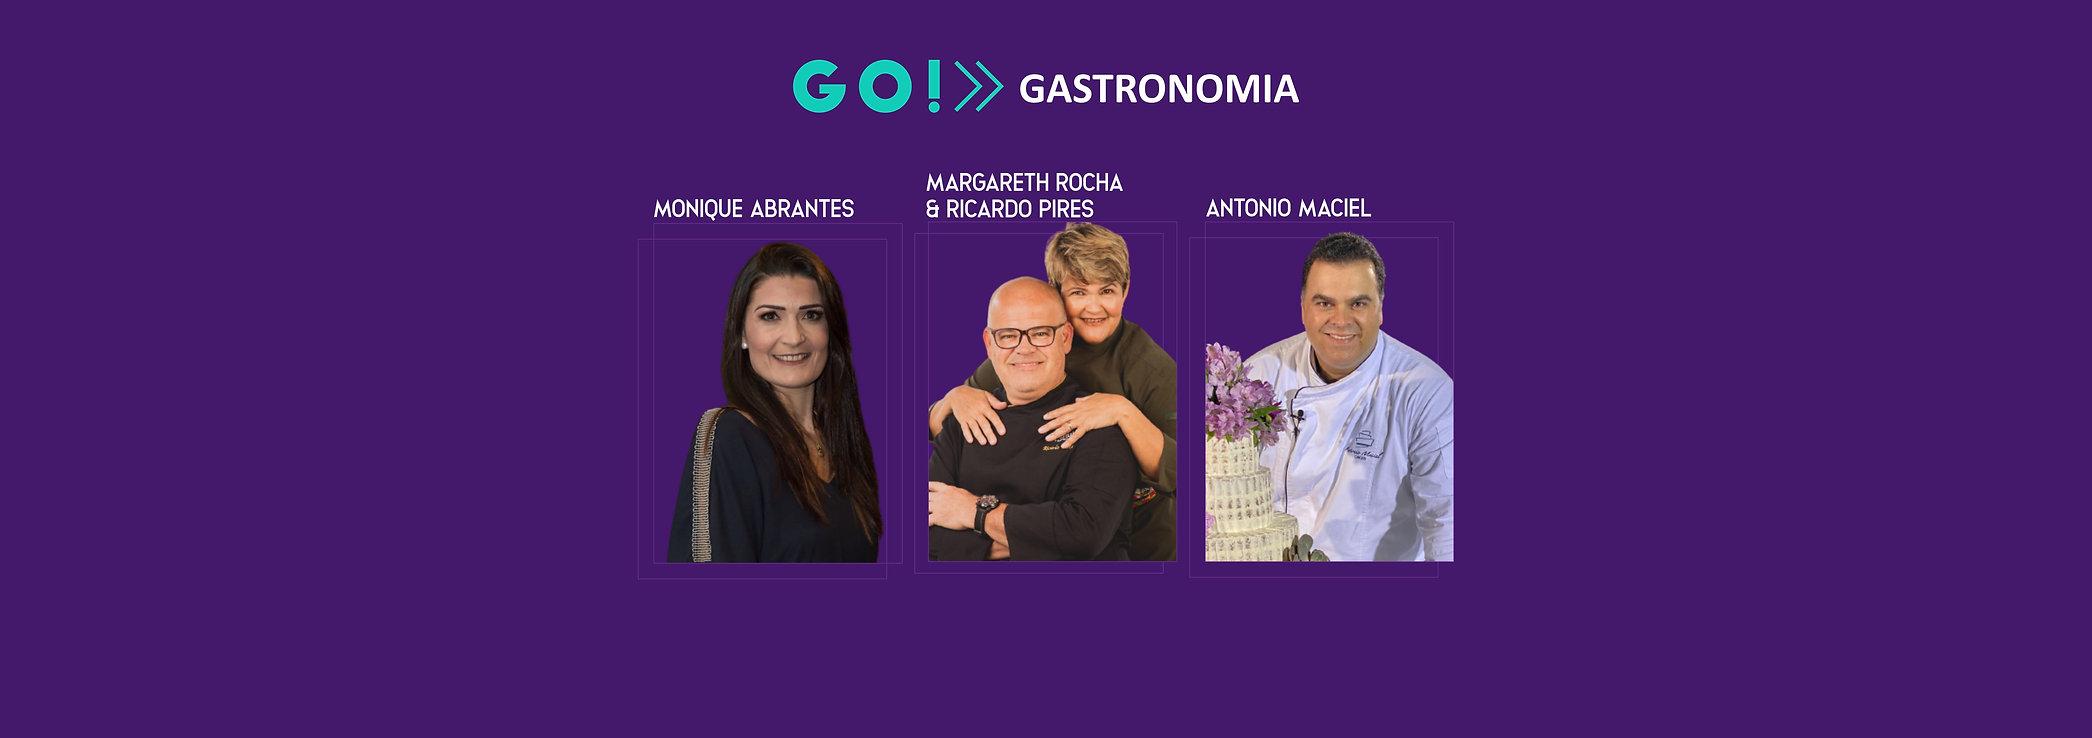 GO GASTRONOMIA.jpg